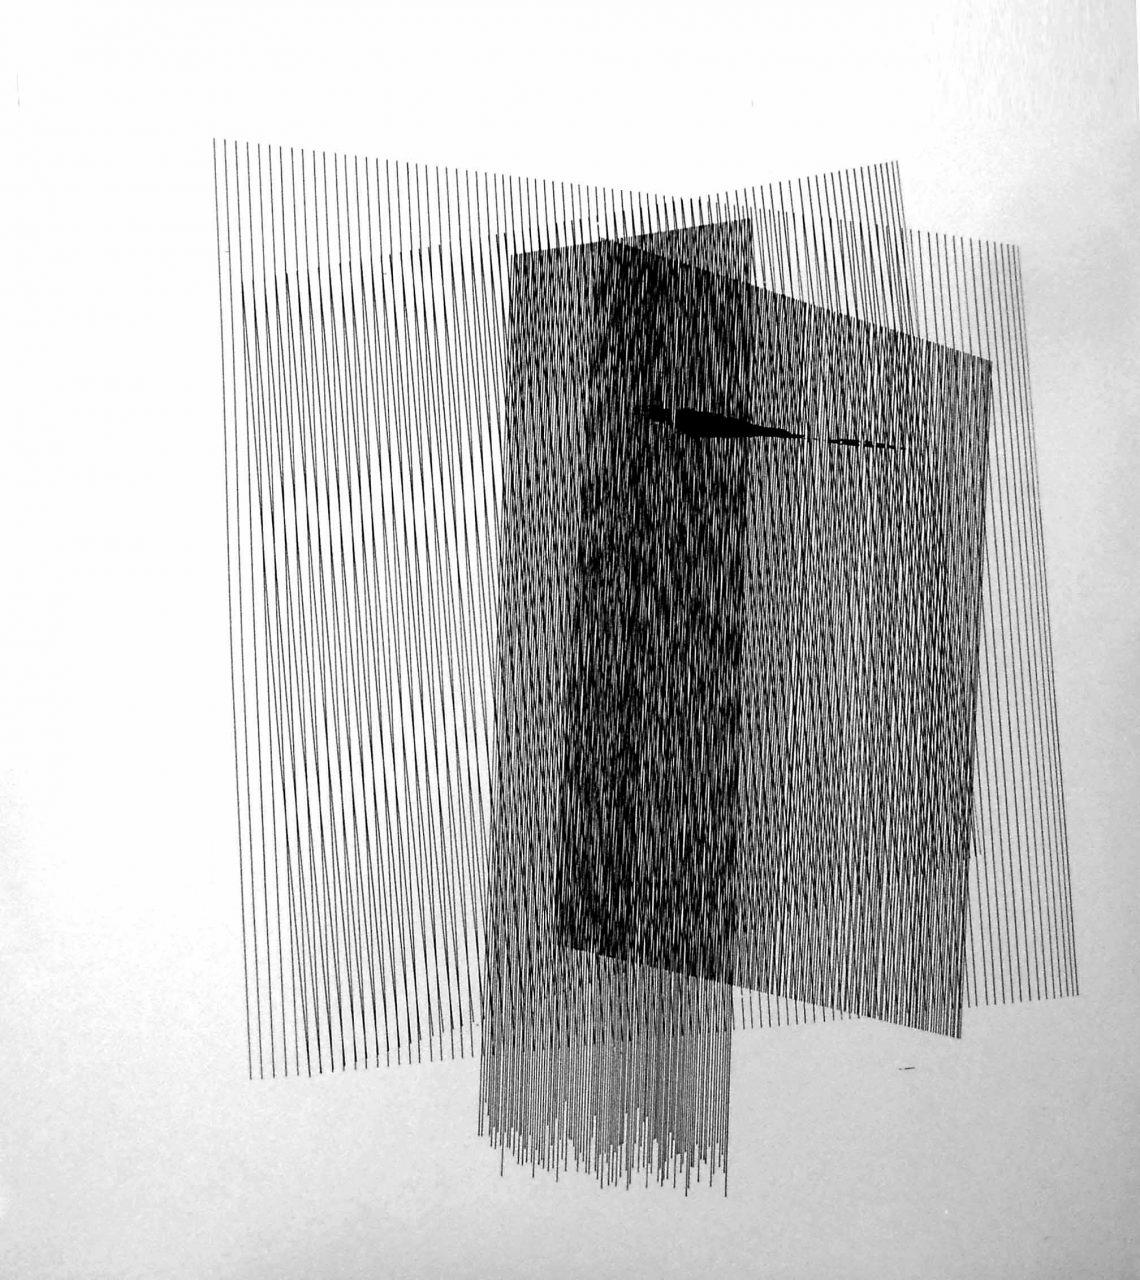 op158, ink on paper, 75x70cm